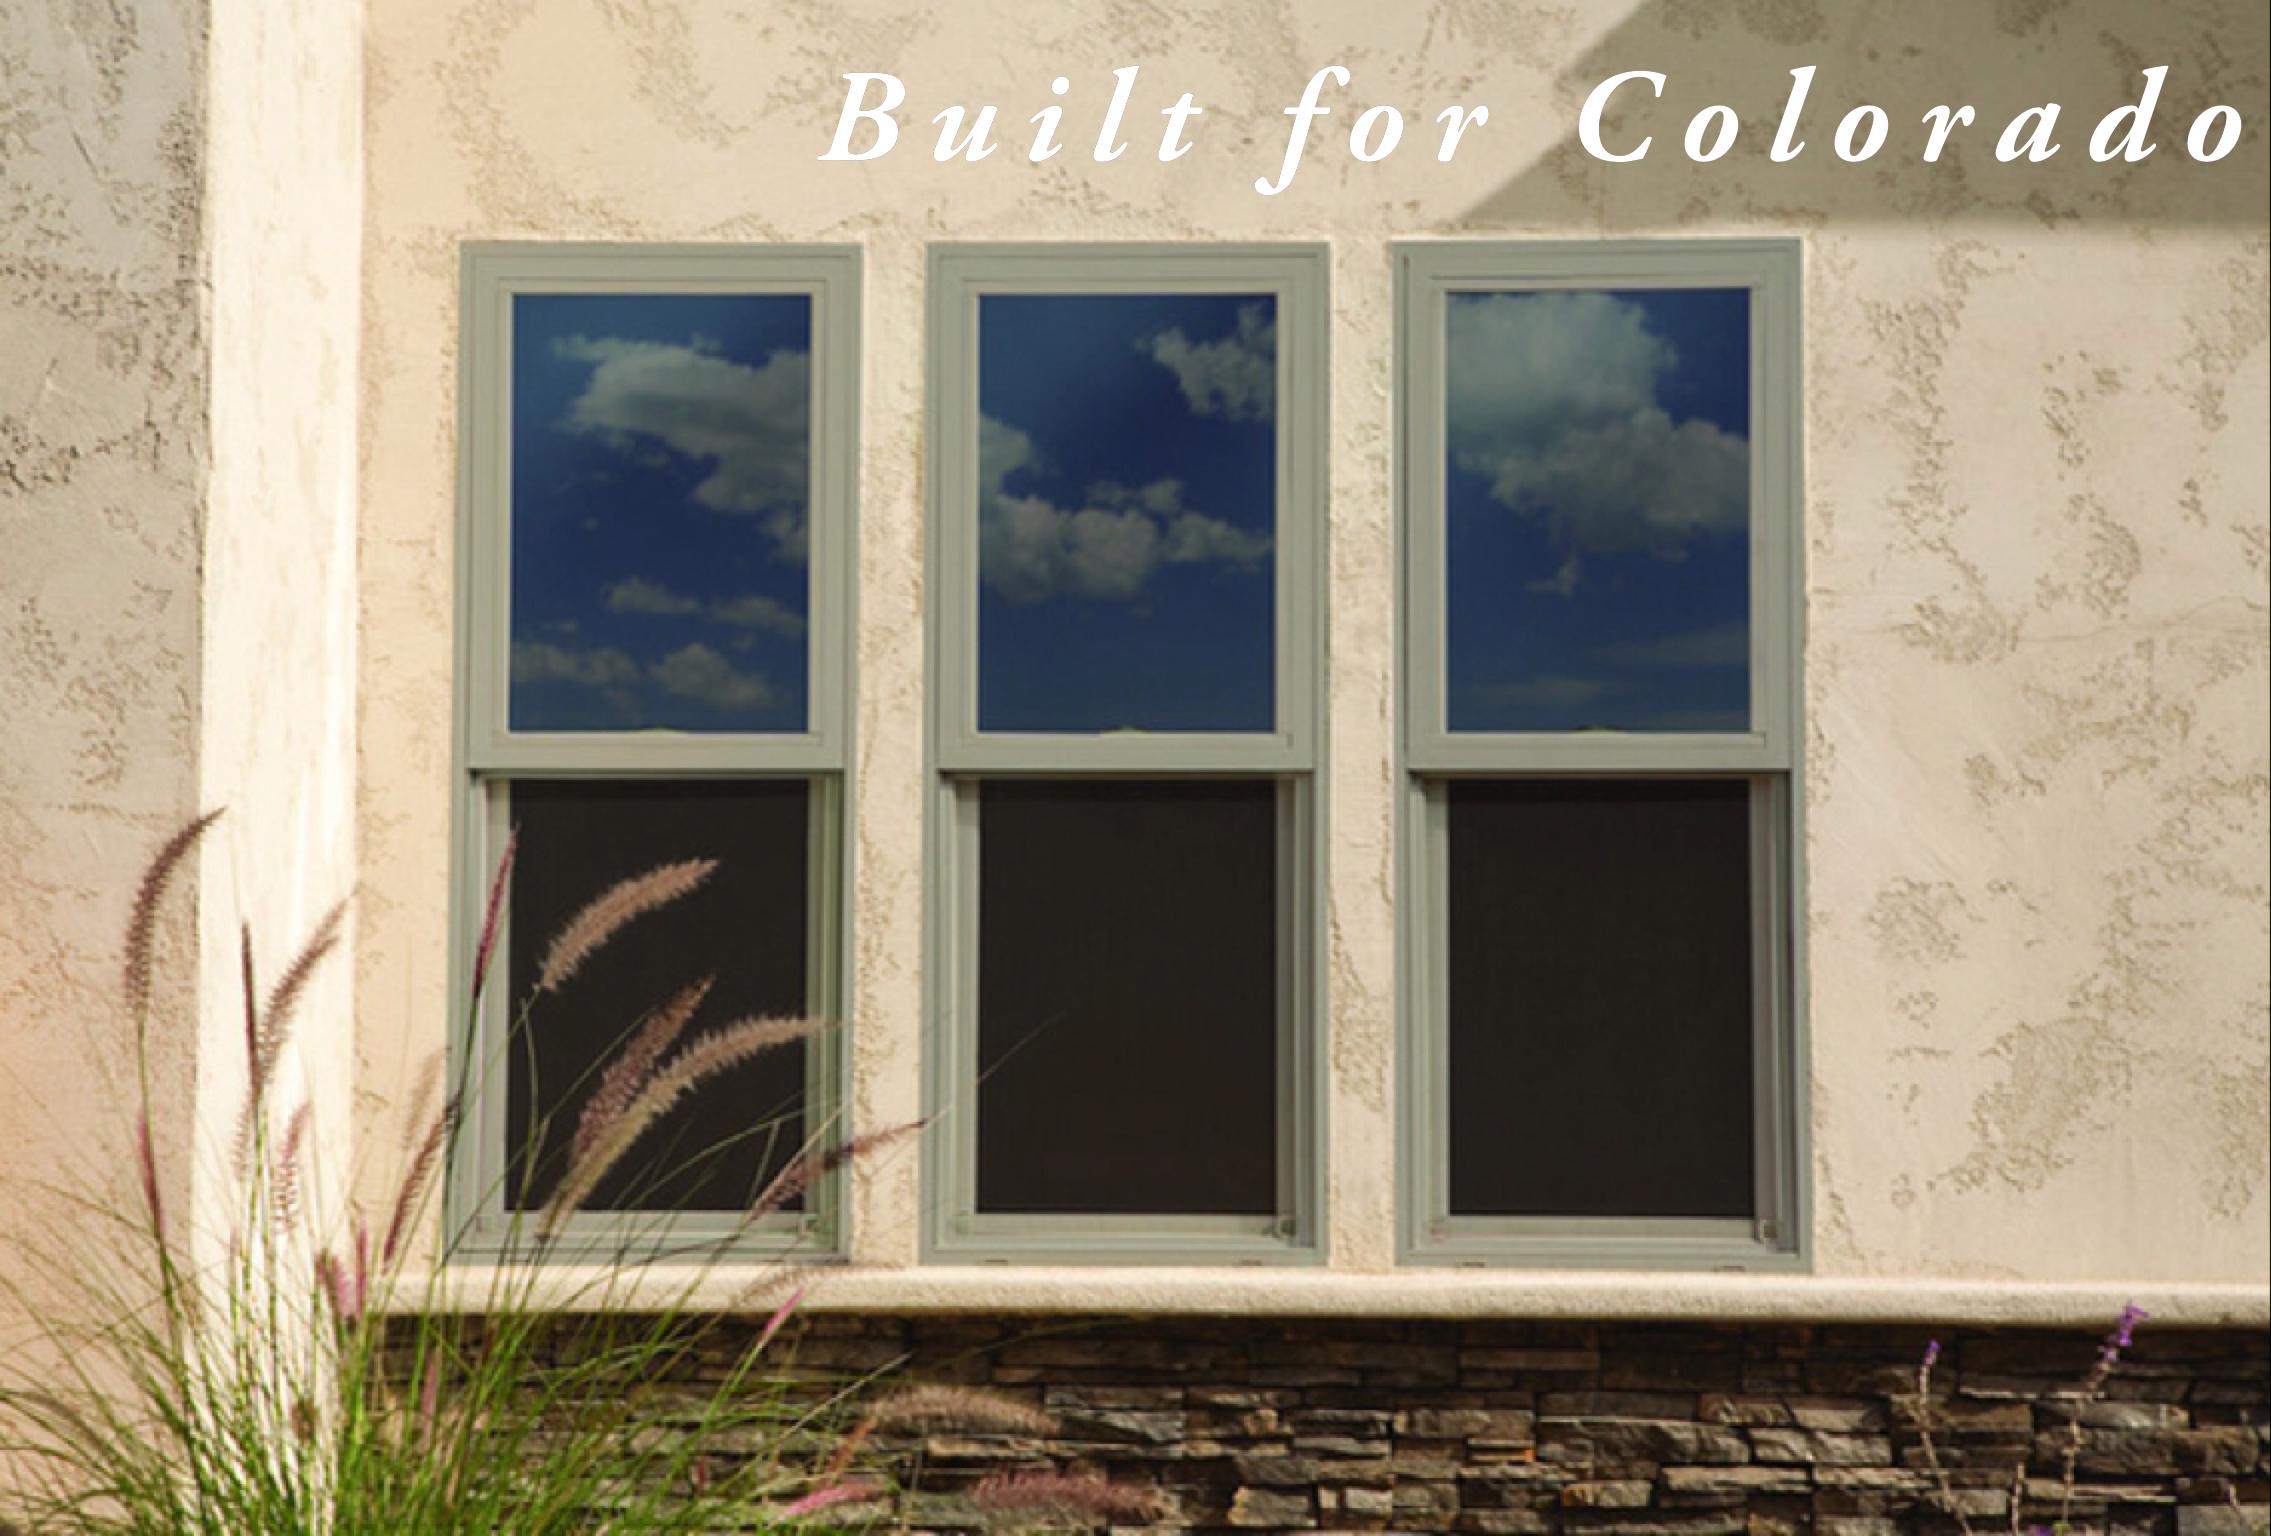 replacement windows, windows, colorado, denver, trwindowservices